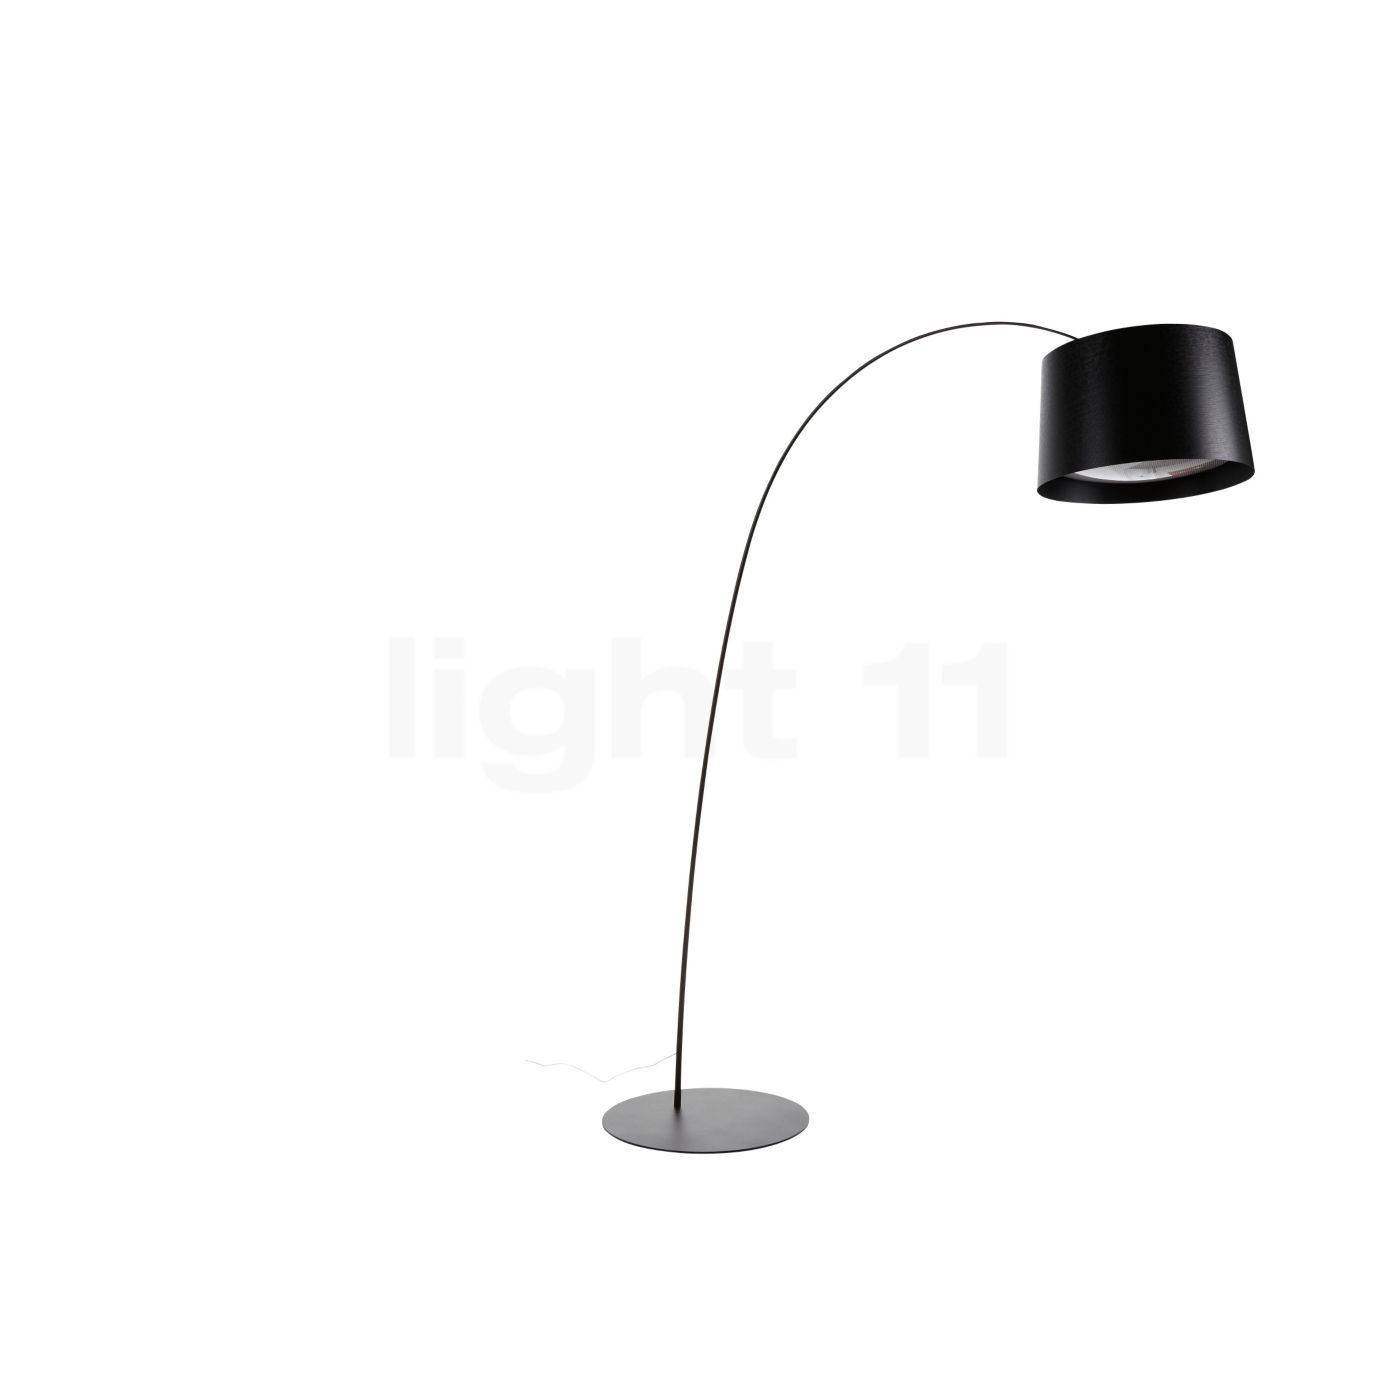 Foscarini twiggy terra stehleuchte kaufen bei light11 parisarafo Choice Image